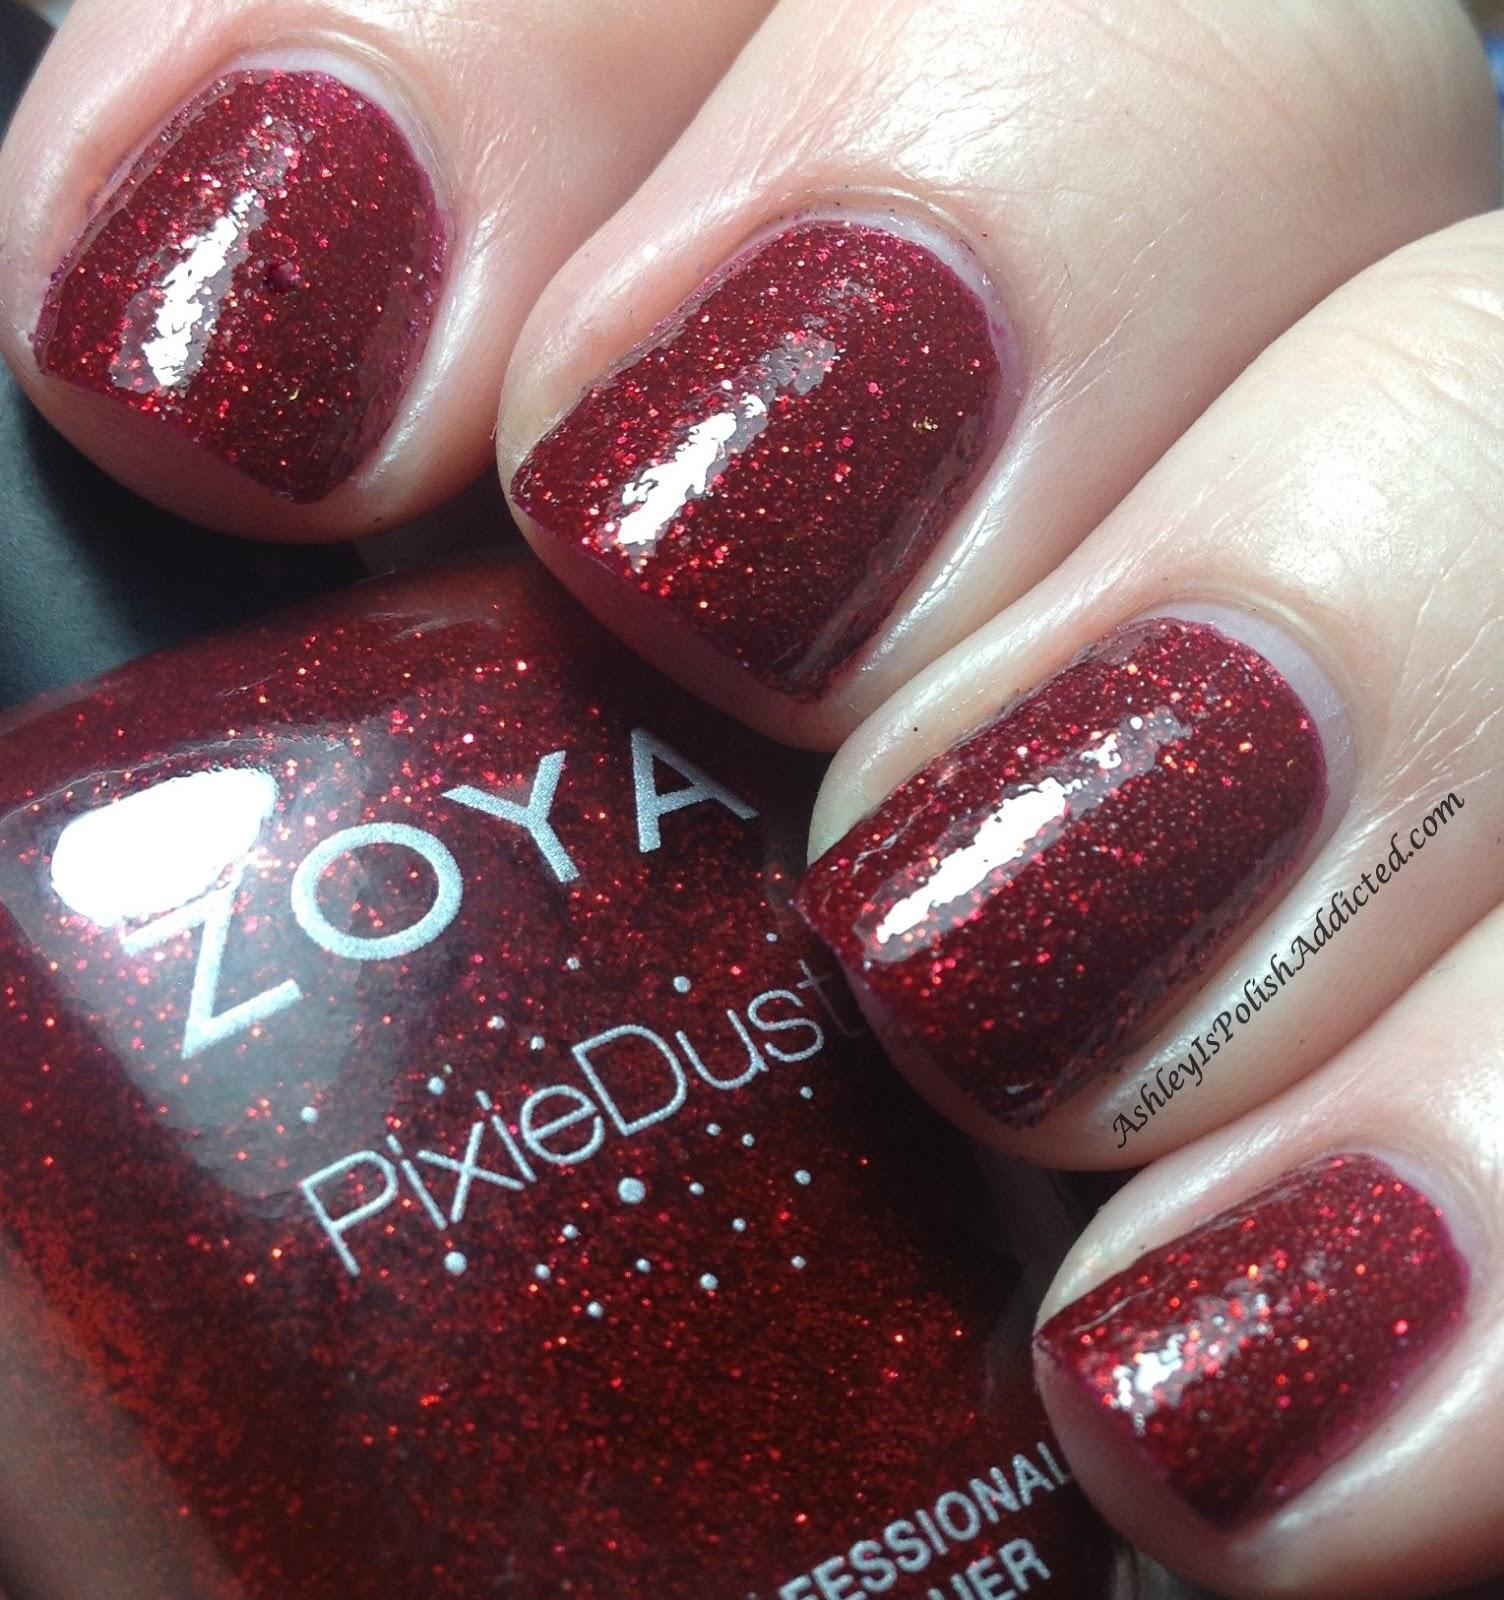 Ashley is PolishAddicted: Zoya Pixie Dust Collection 2013